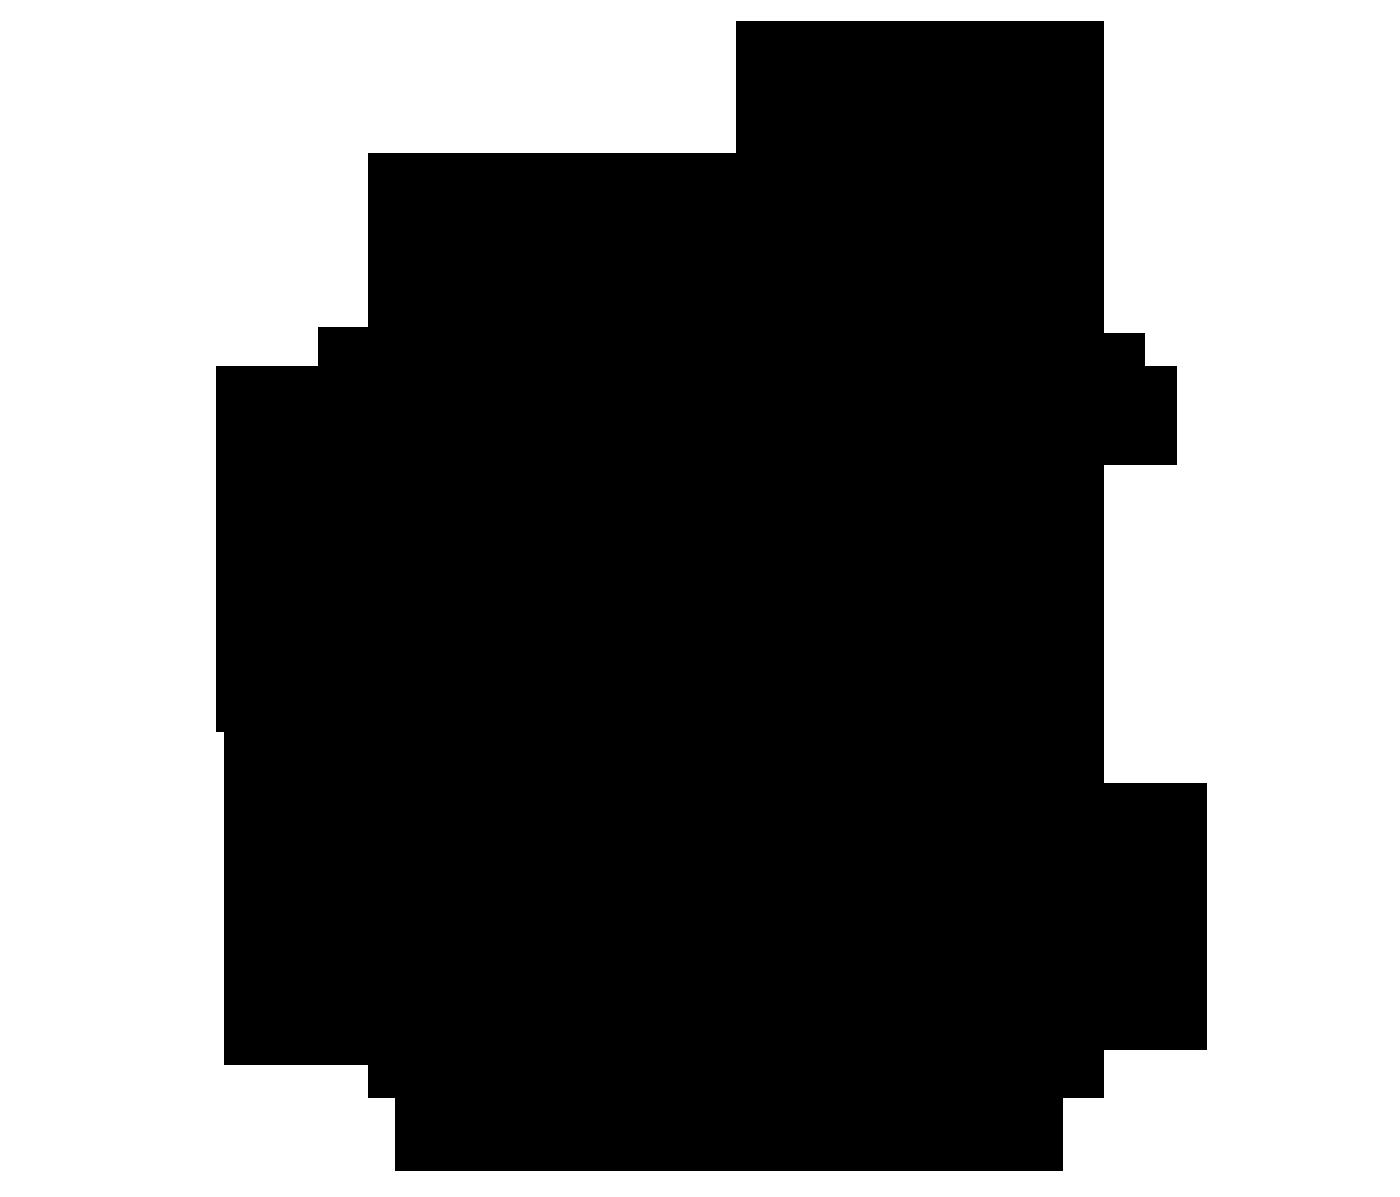 iPhone_logo - Copy